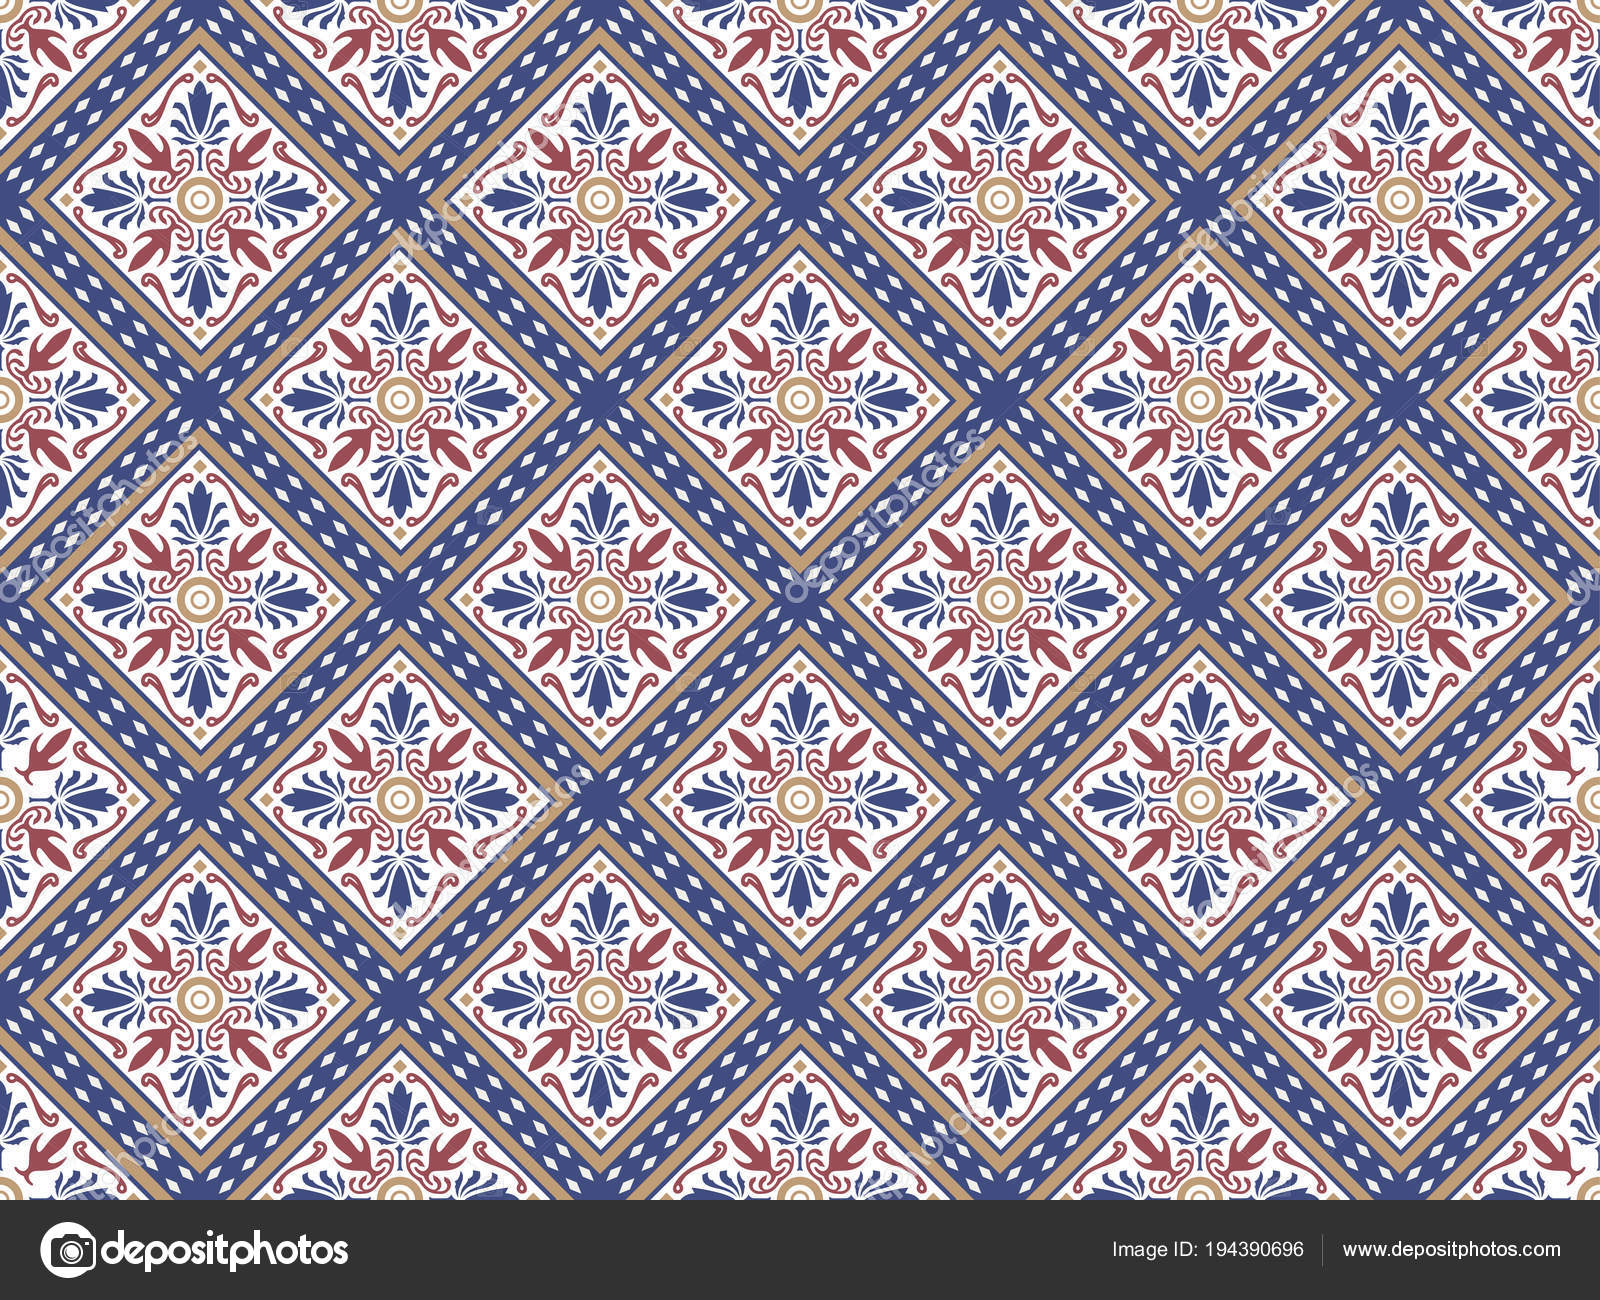 Colorful Decorative Ceramic Seamless Tiles Stock Vector Dero2010